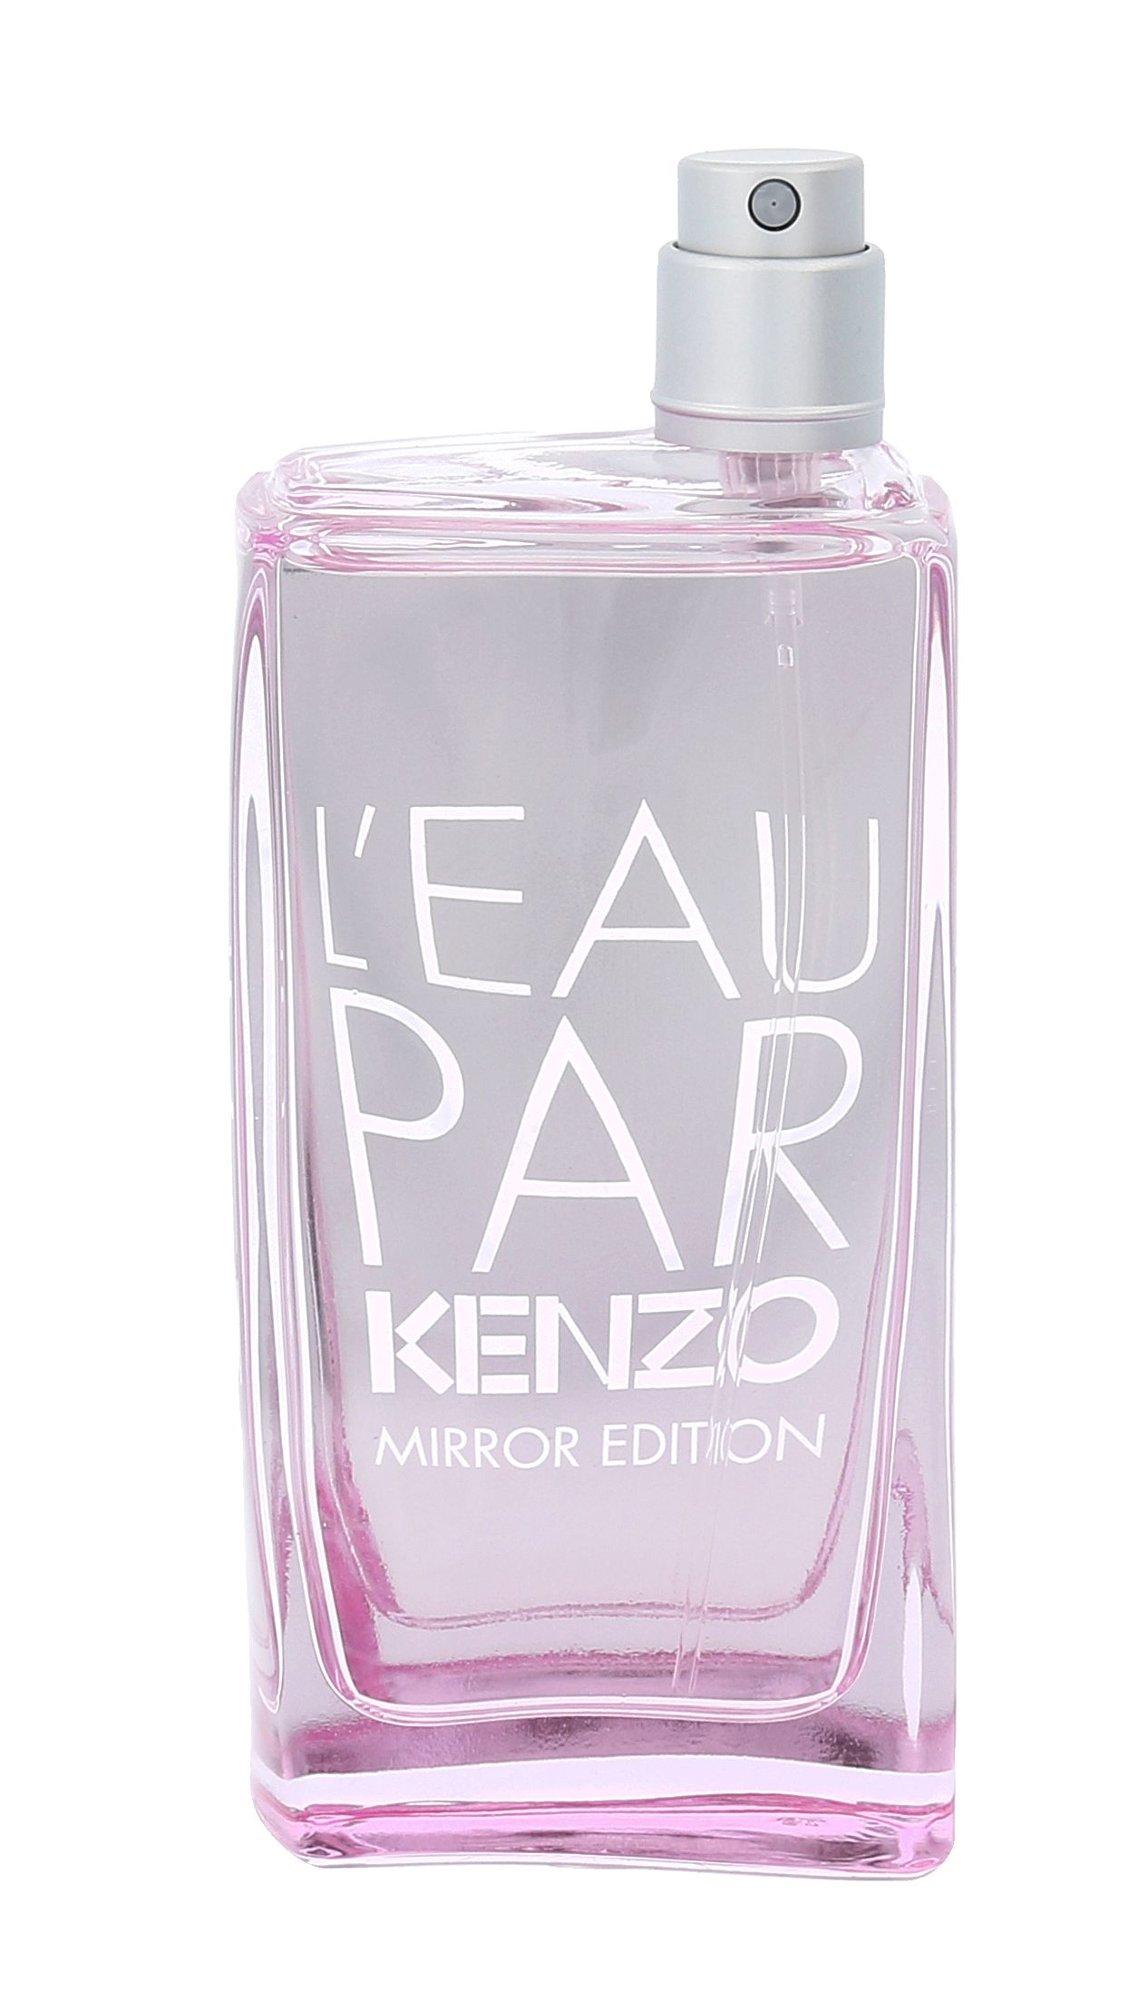 KENZO L´eau par Kenzo Mirror Edition EDT 50ml